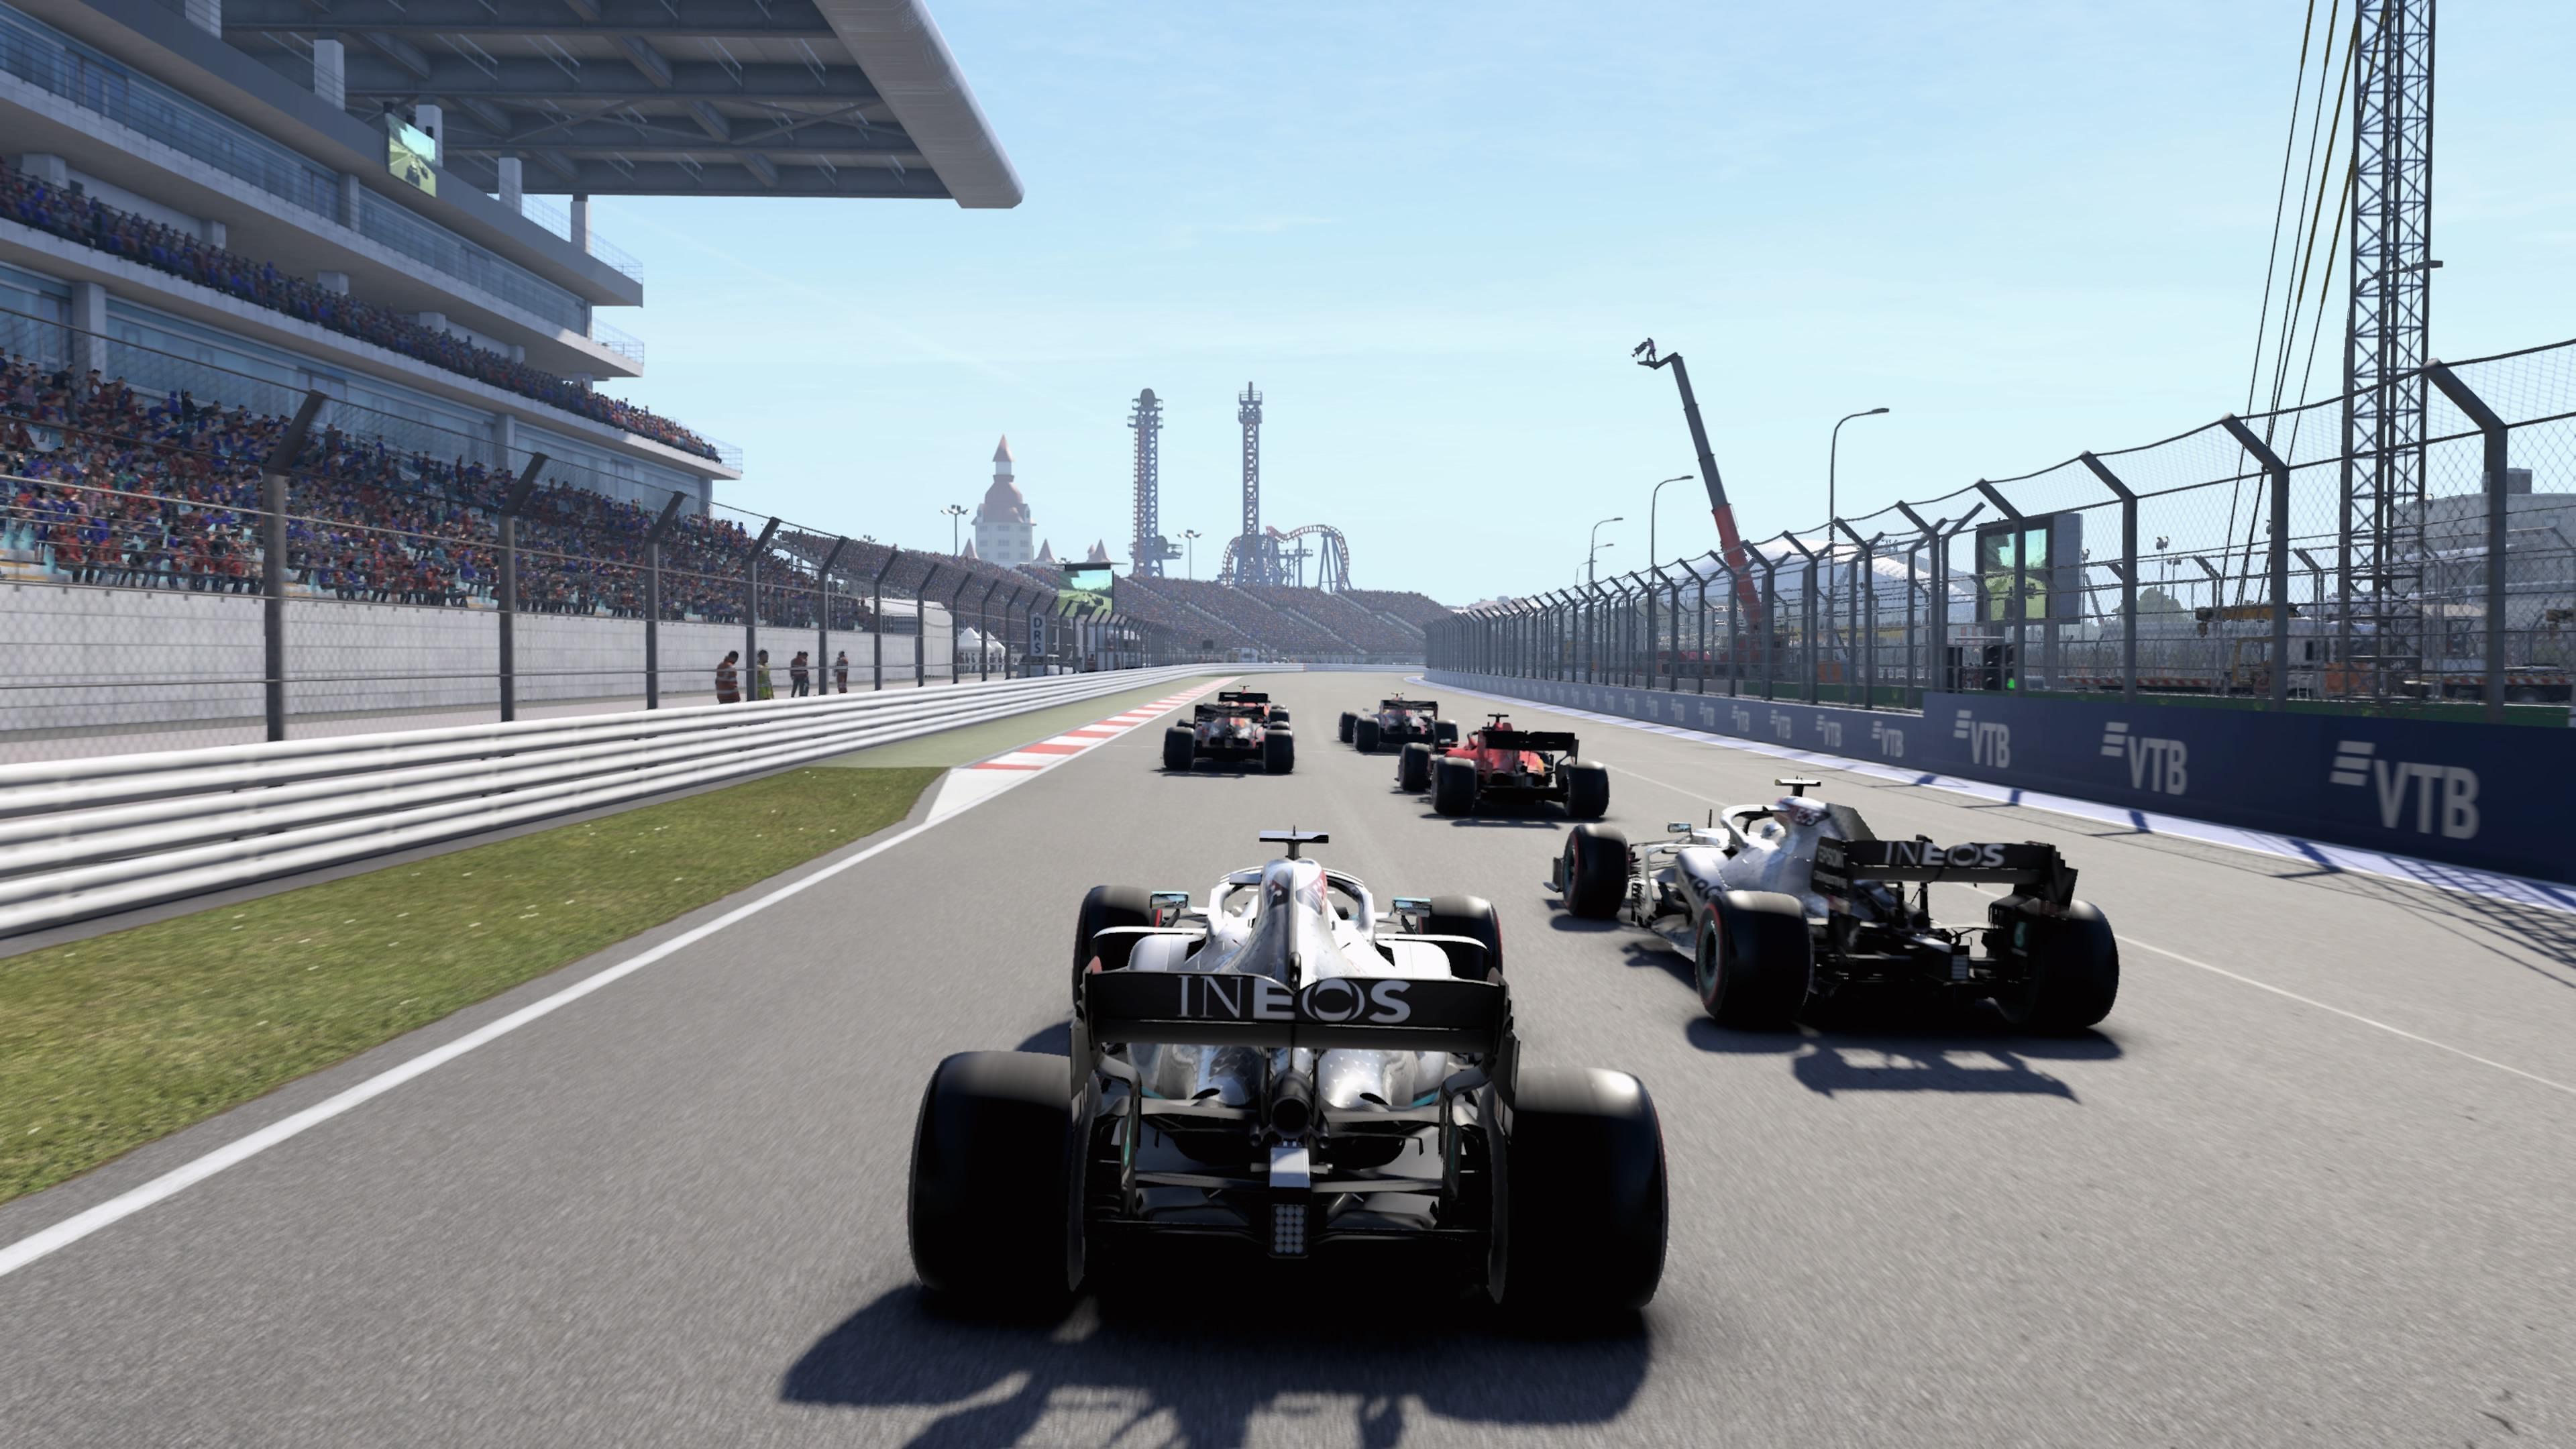 Letošnja edicija igre je prava poslastica za oboževalce Formule 1.